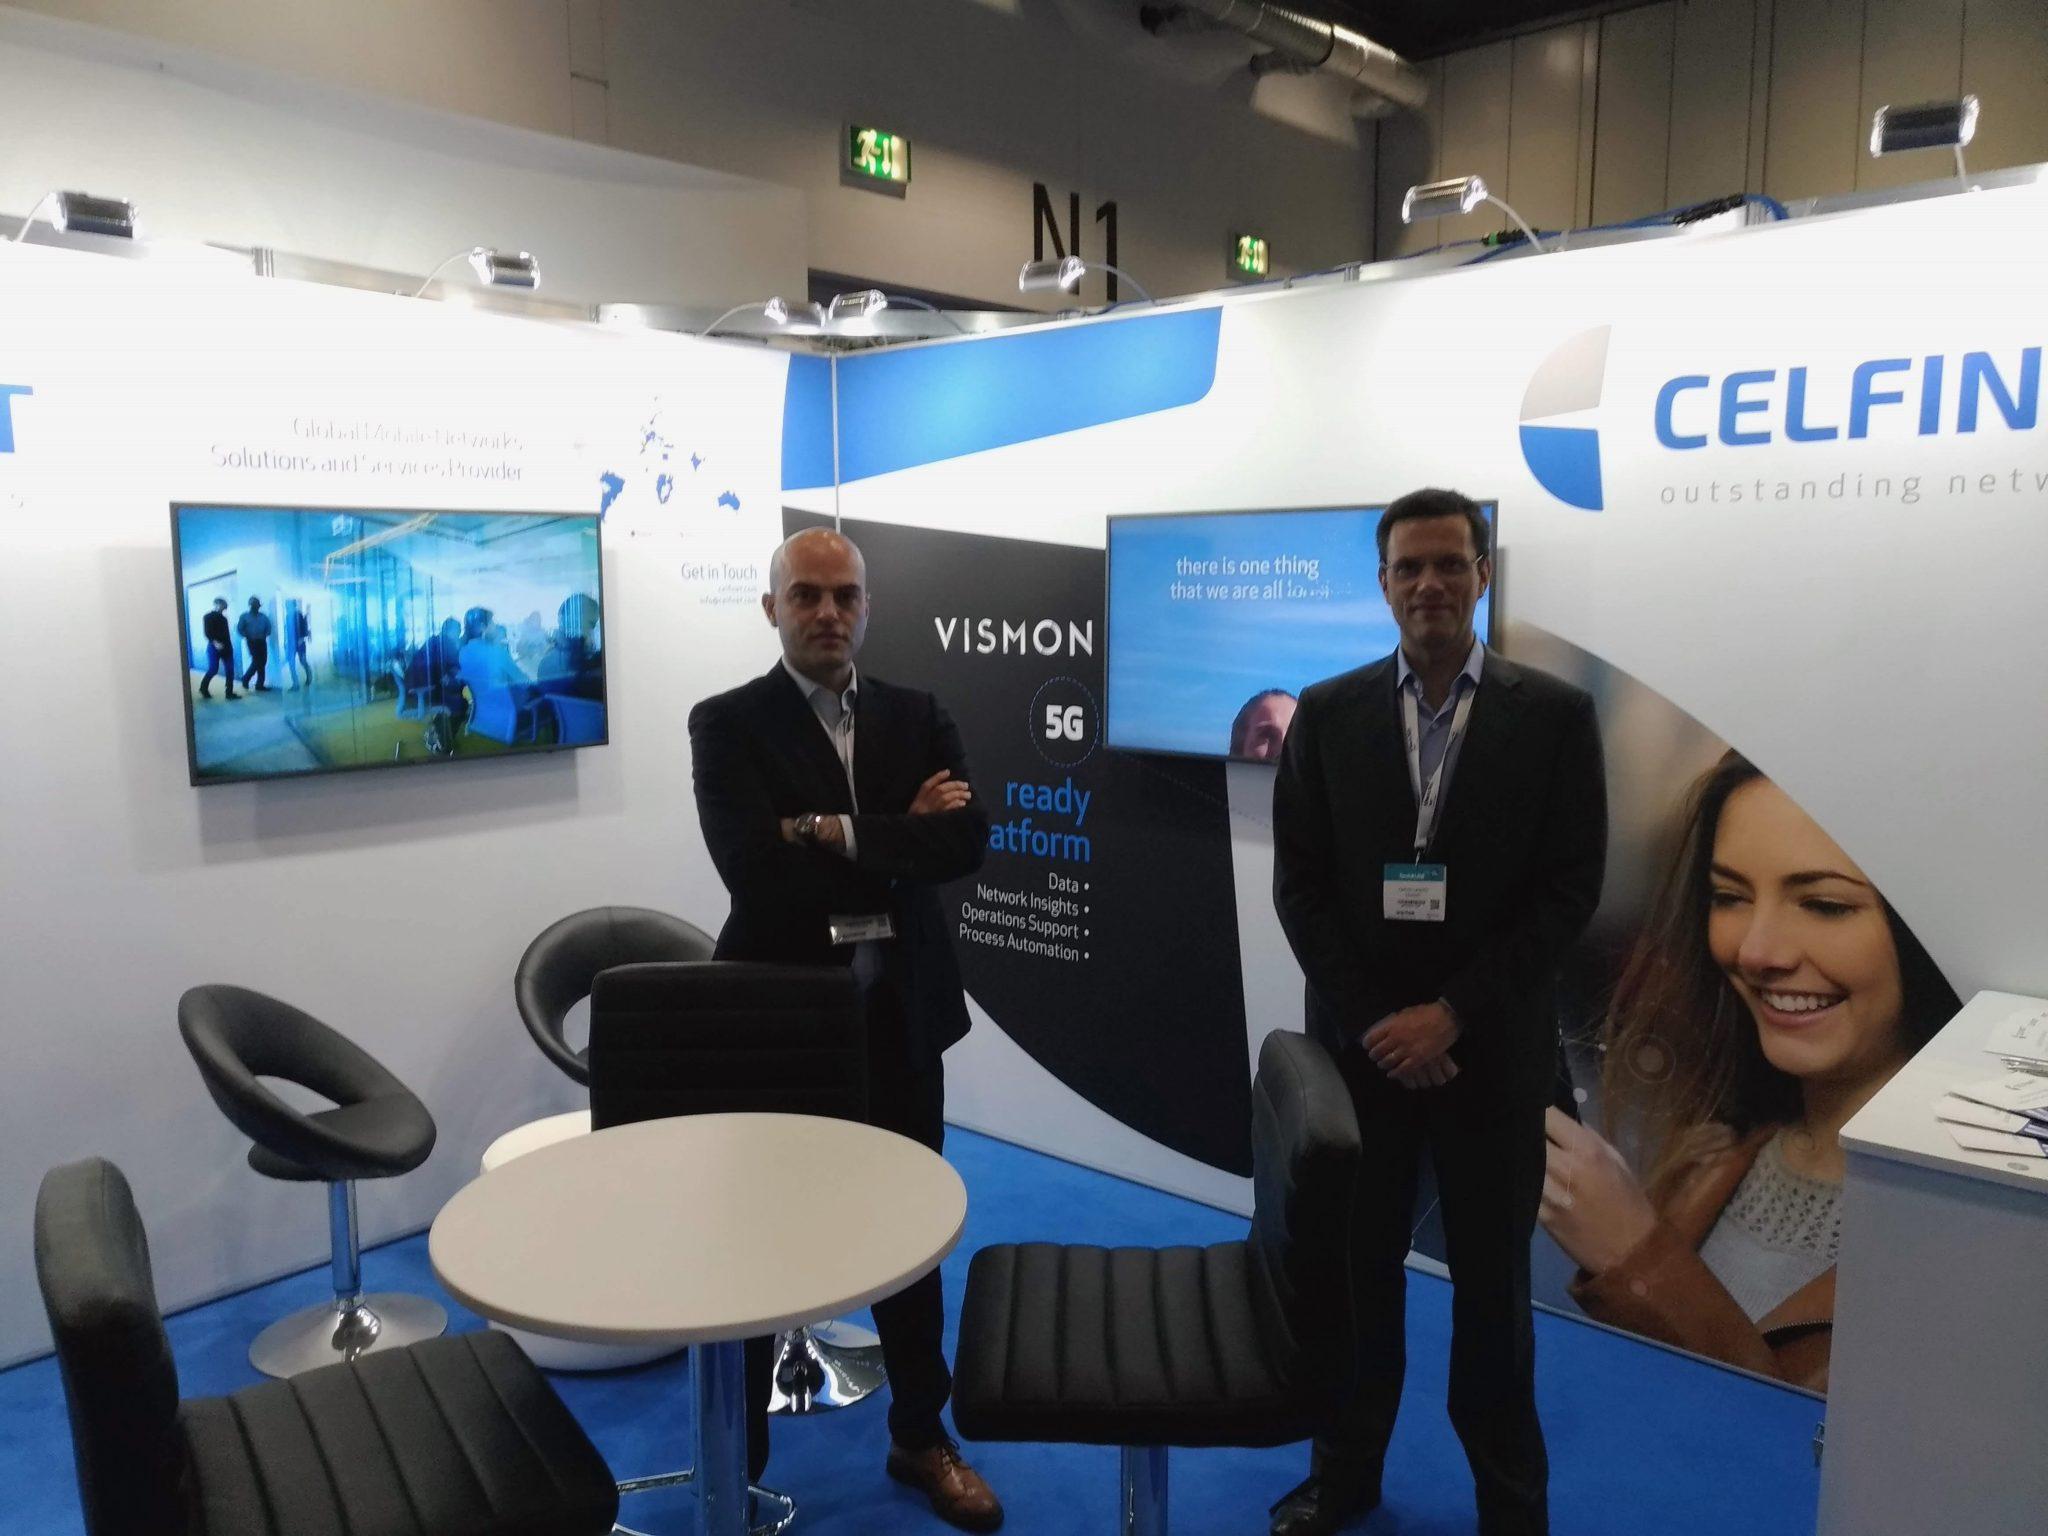 Celfinet's 5G-ready platform VISMON at TechXLR8 in London